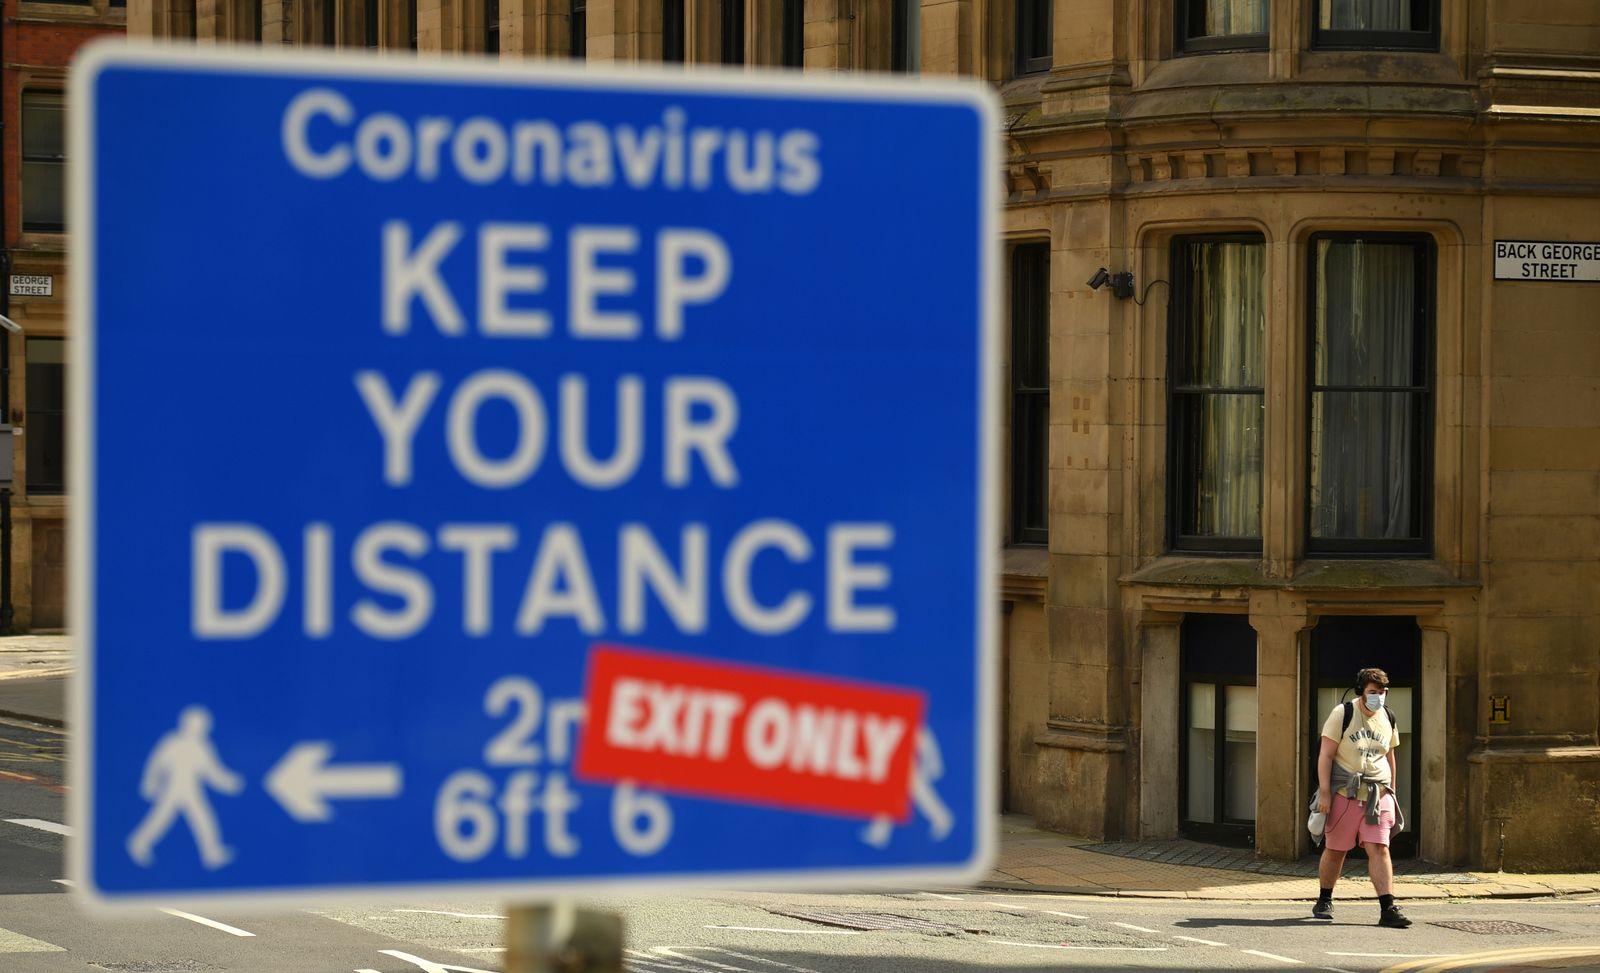 FILES-BRITAIN-HEALTH-VIRUS